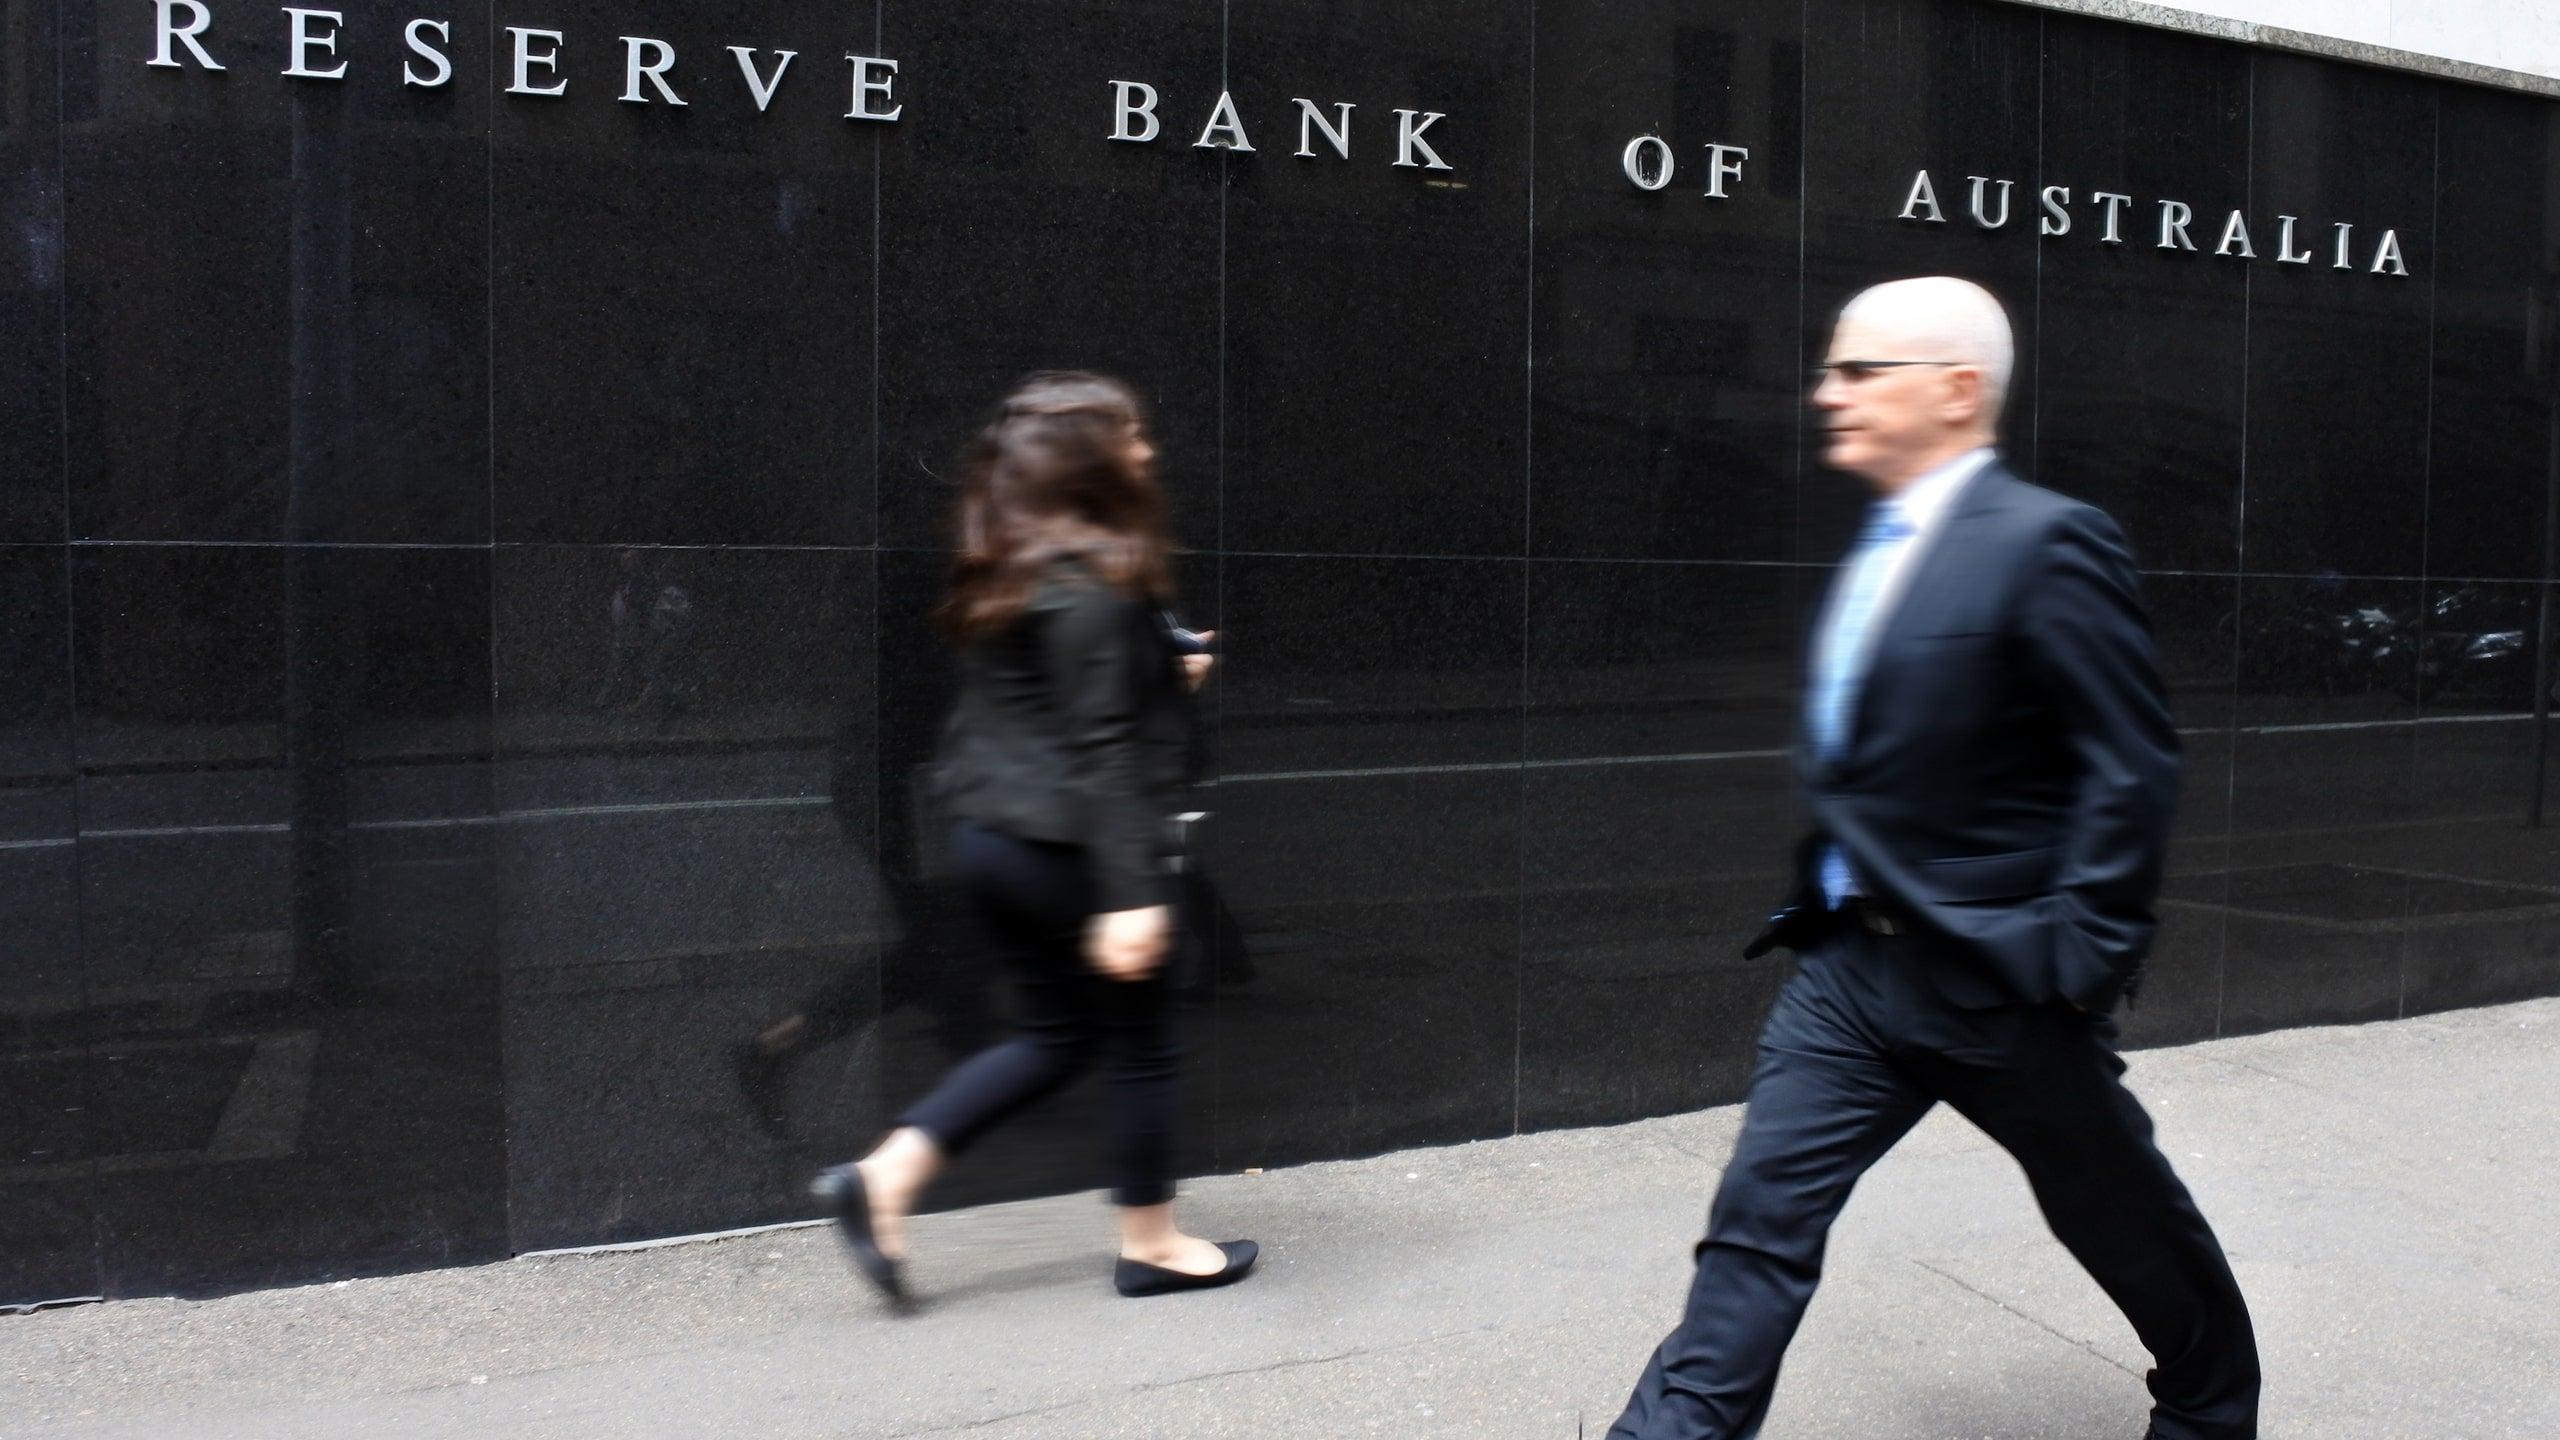 Reserve Bank of Australia-min.jpg